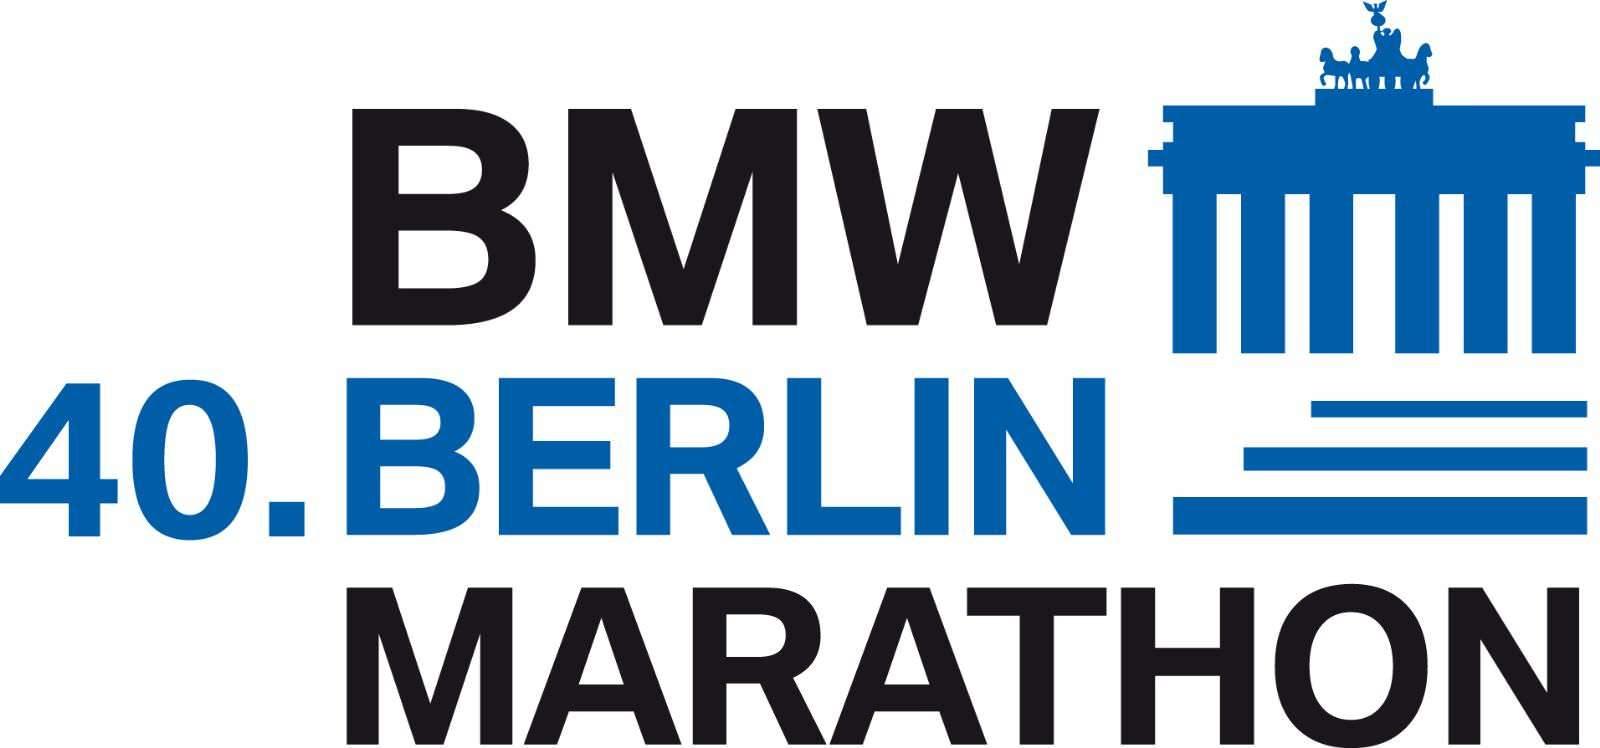 130929-berlin-marathon-logo-hd